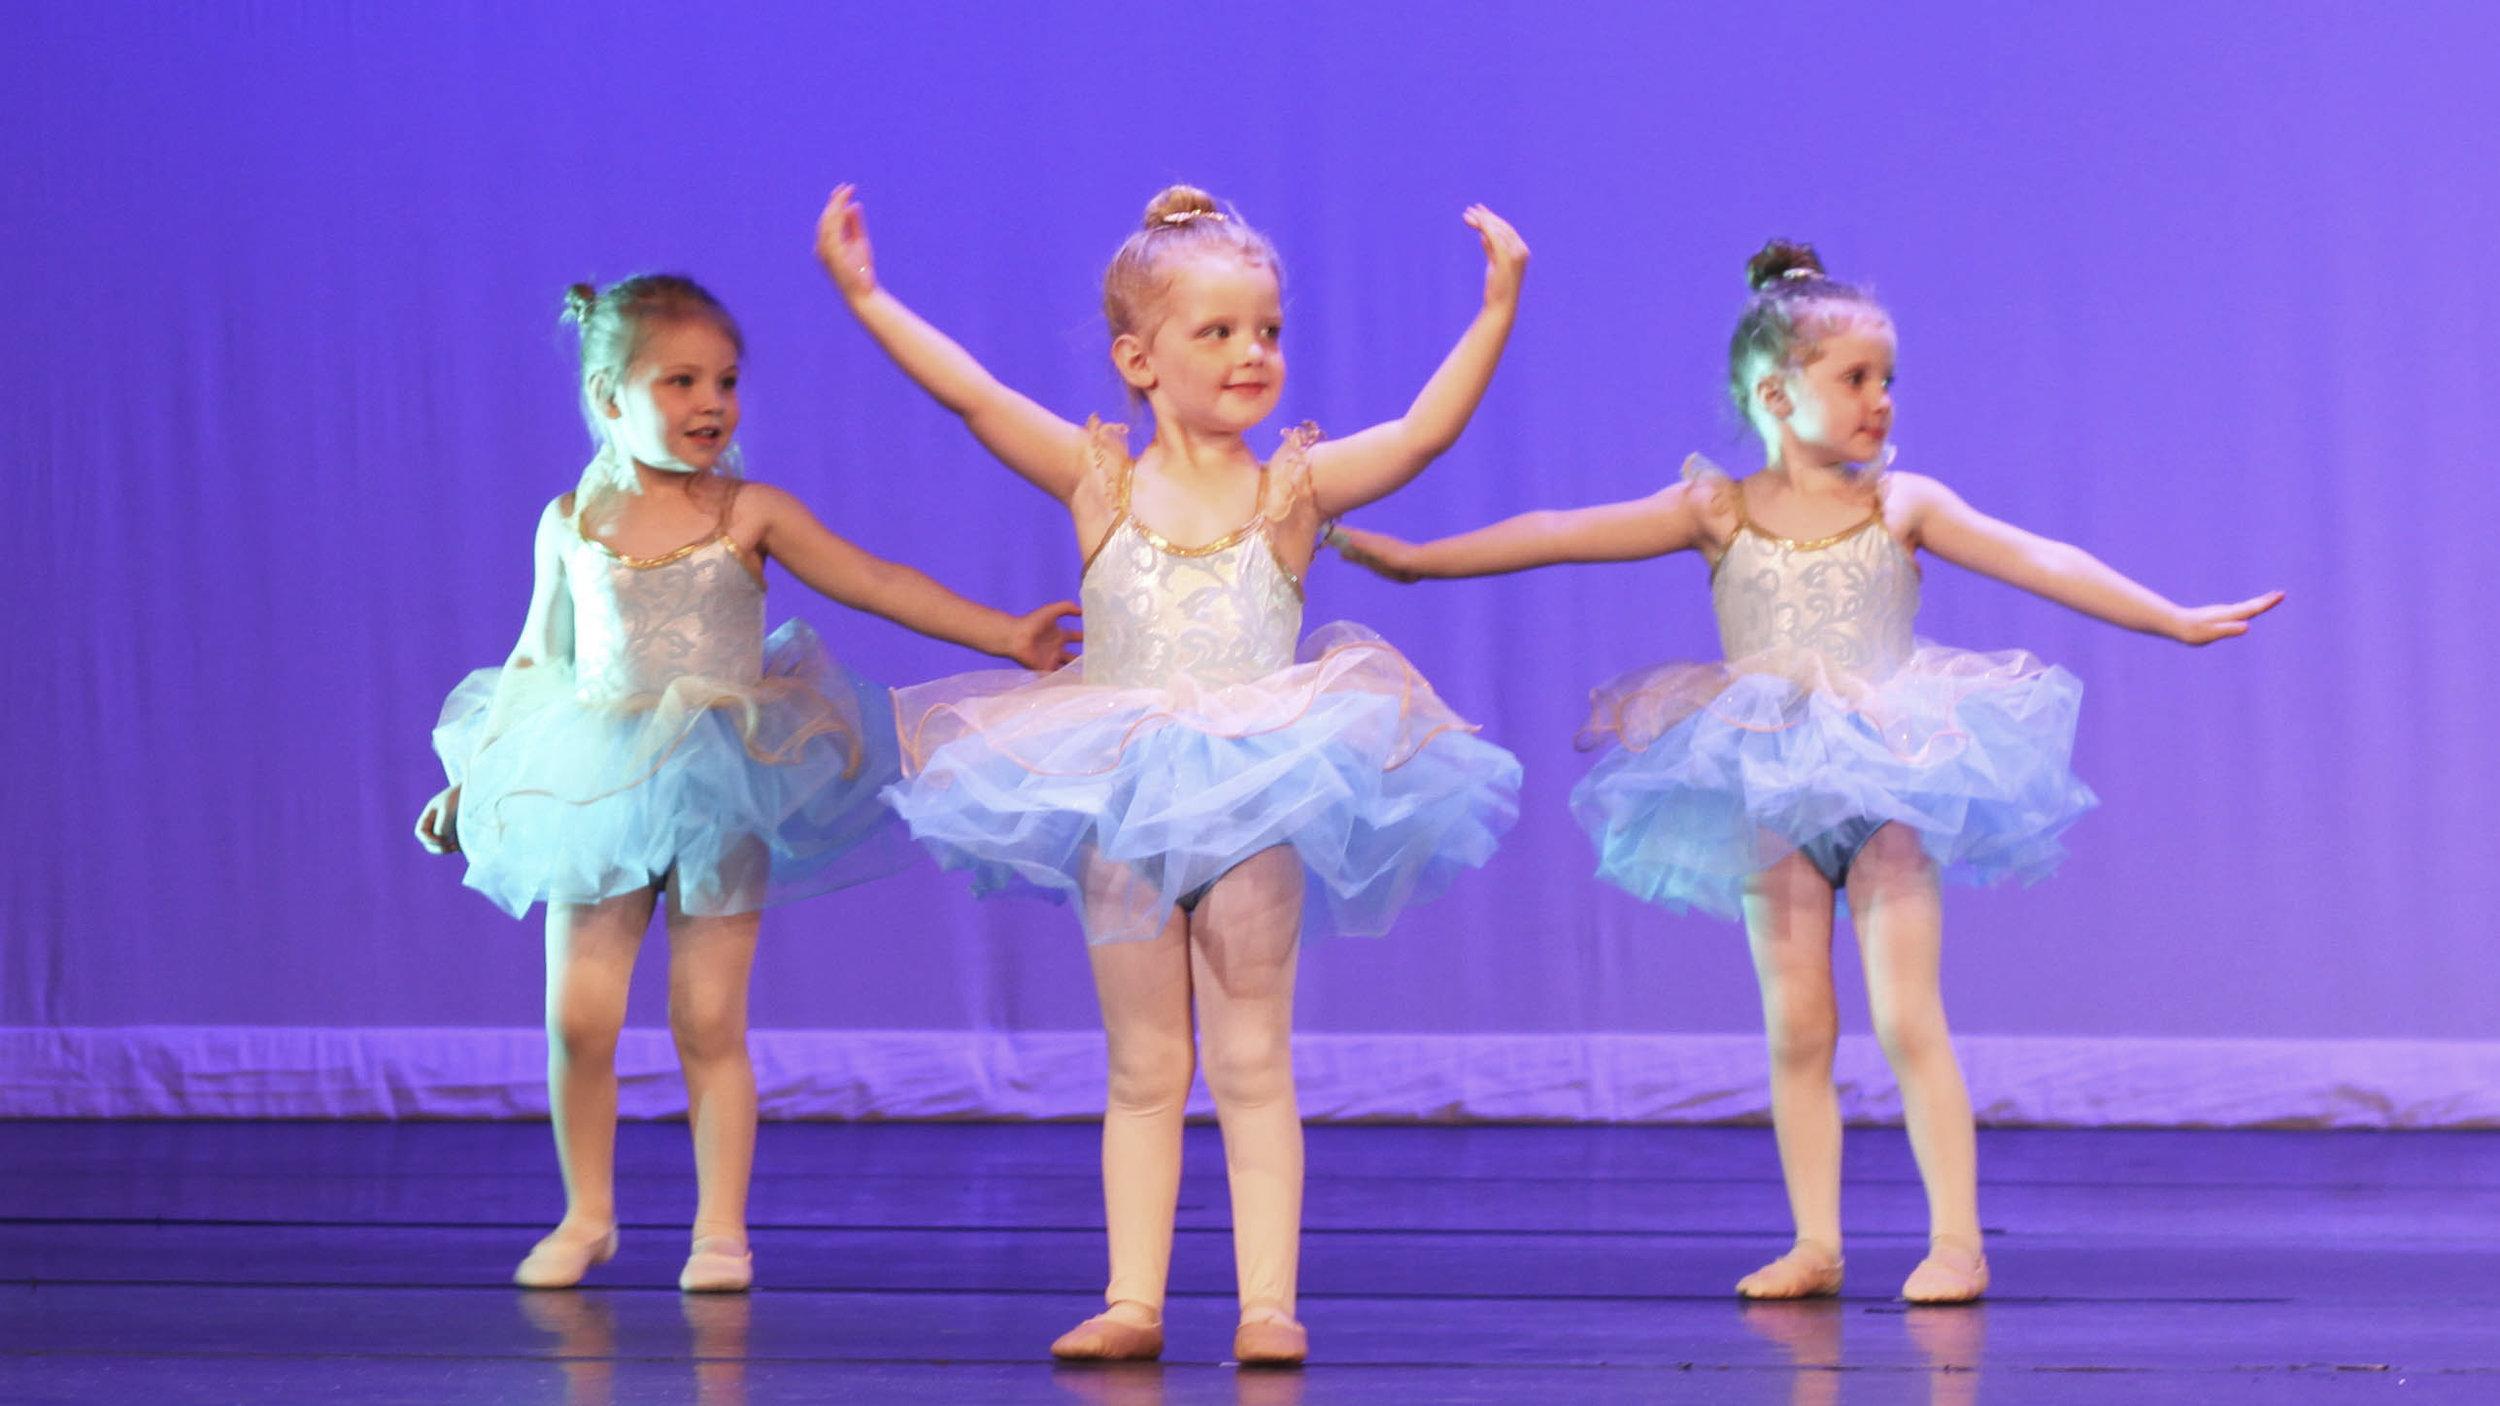 Dance_Children_Recital_Photography_3.jpg